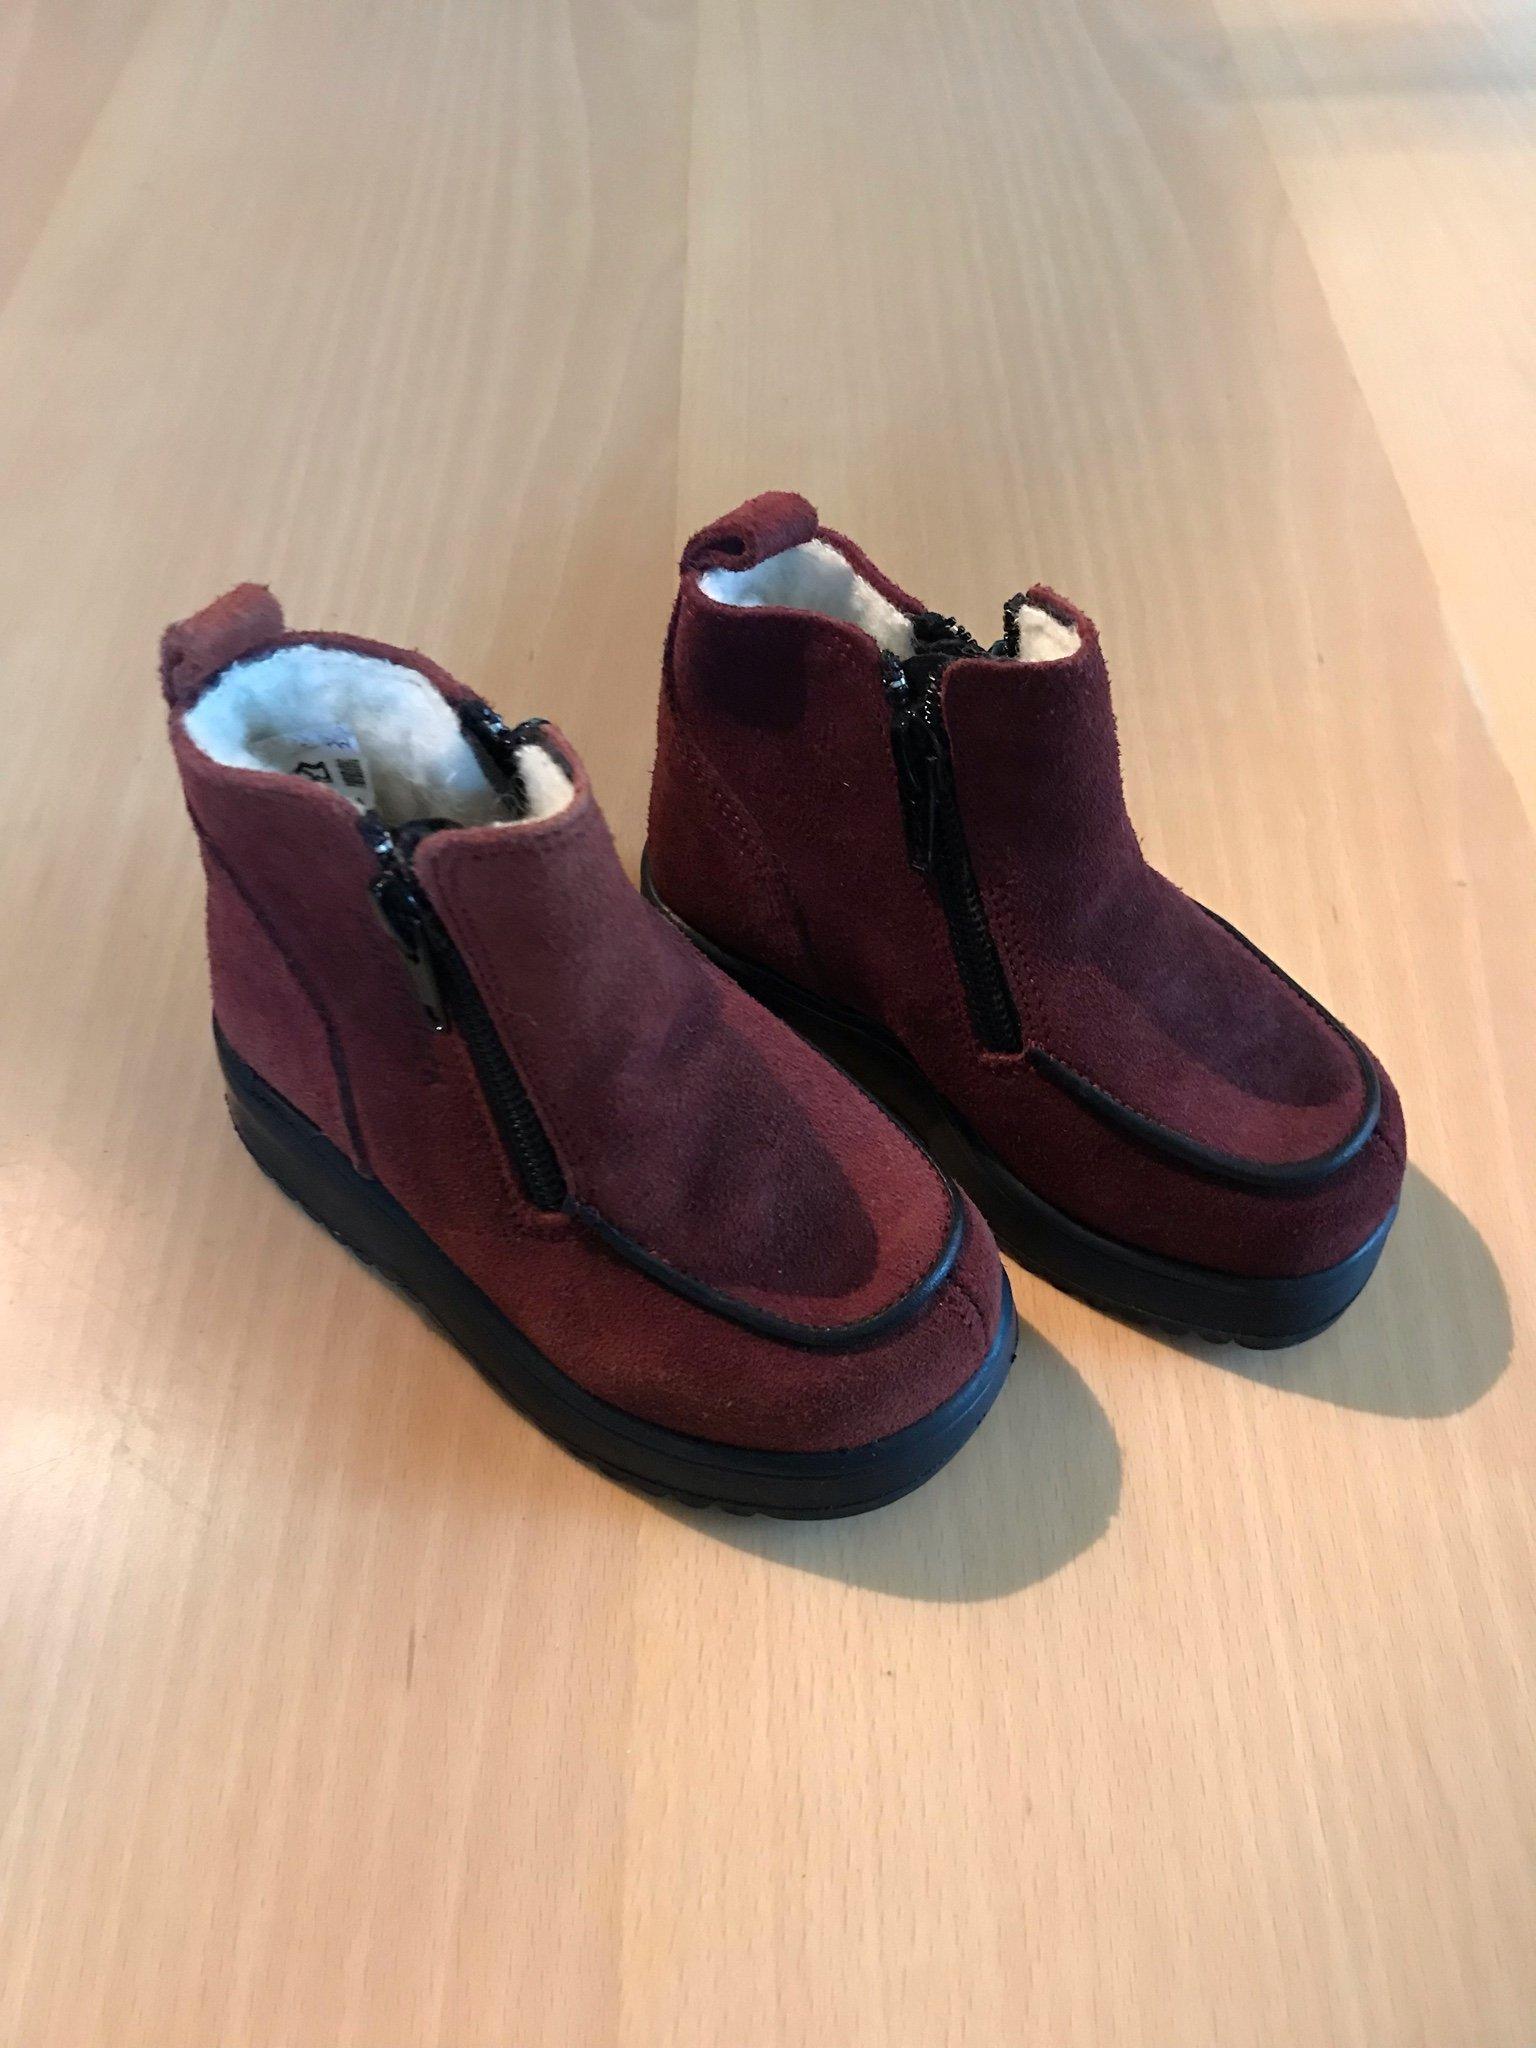 Vinter kängor skor Din sko vinröda stl 23, helt.. (364872774